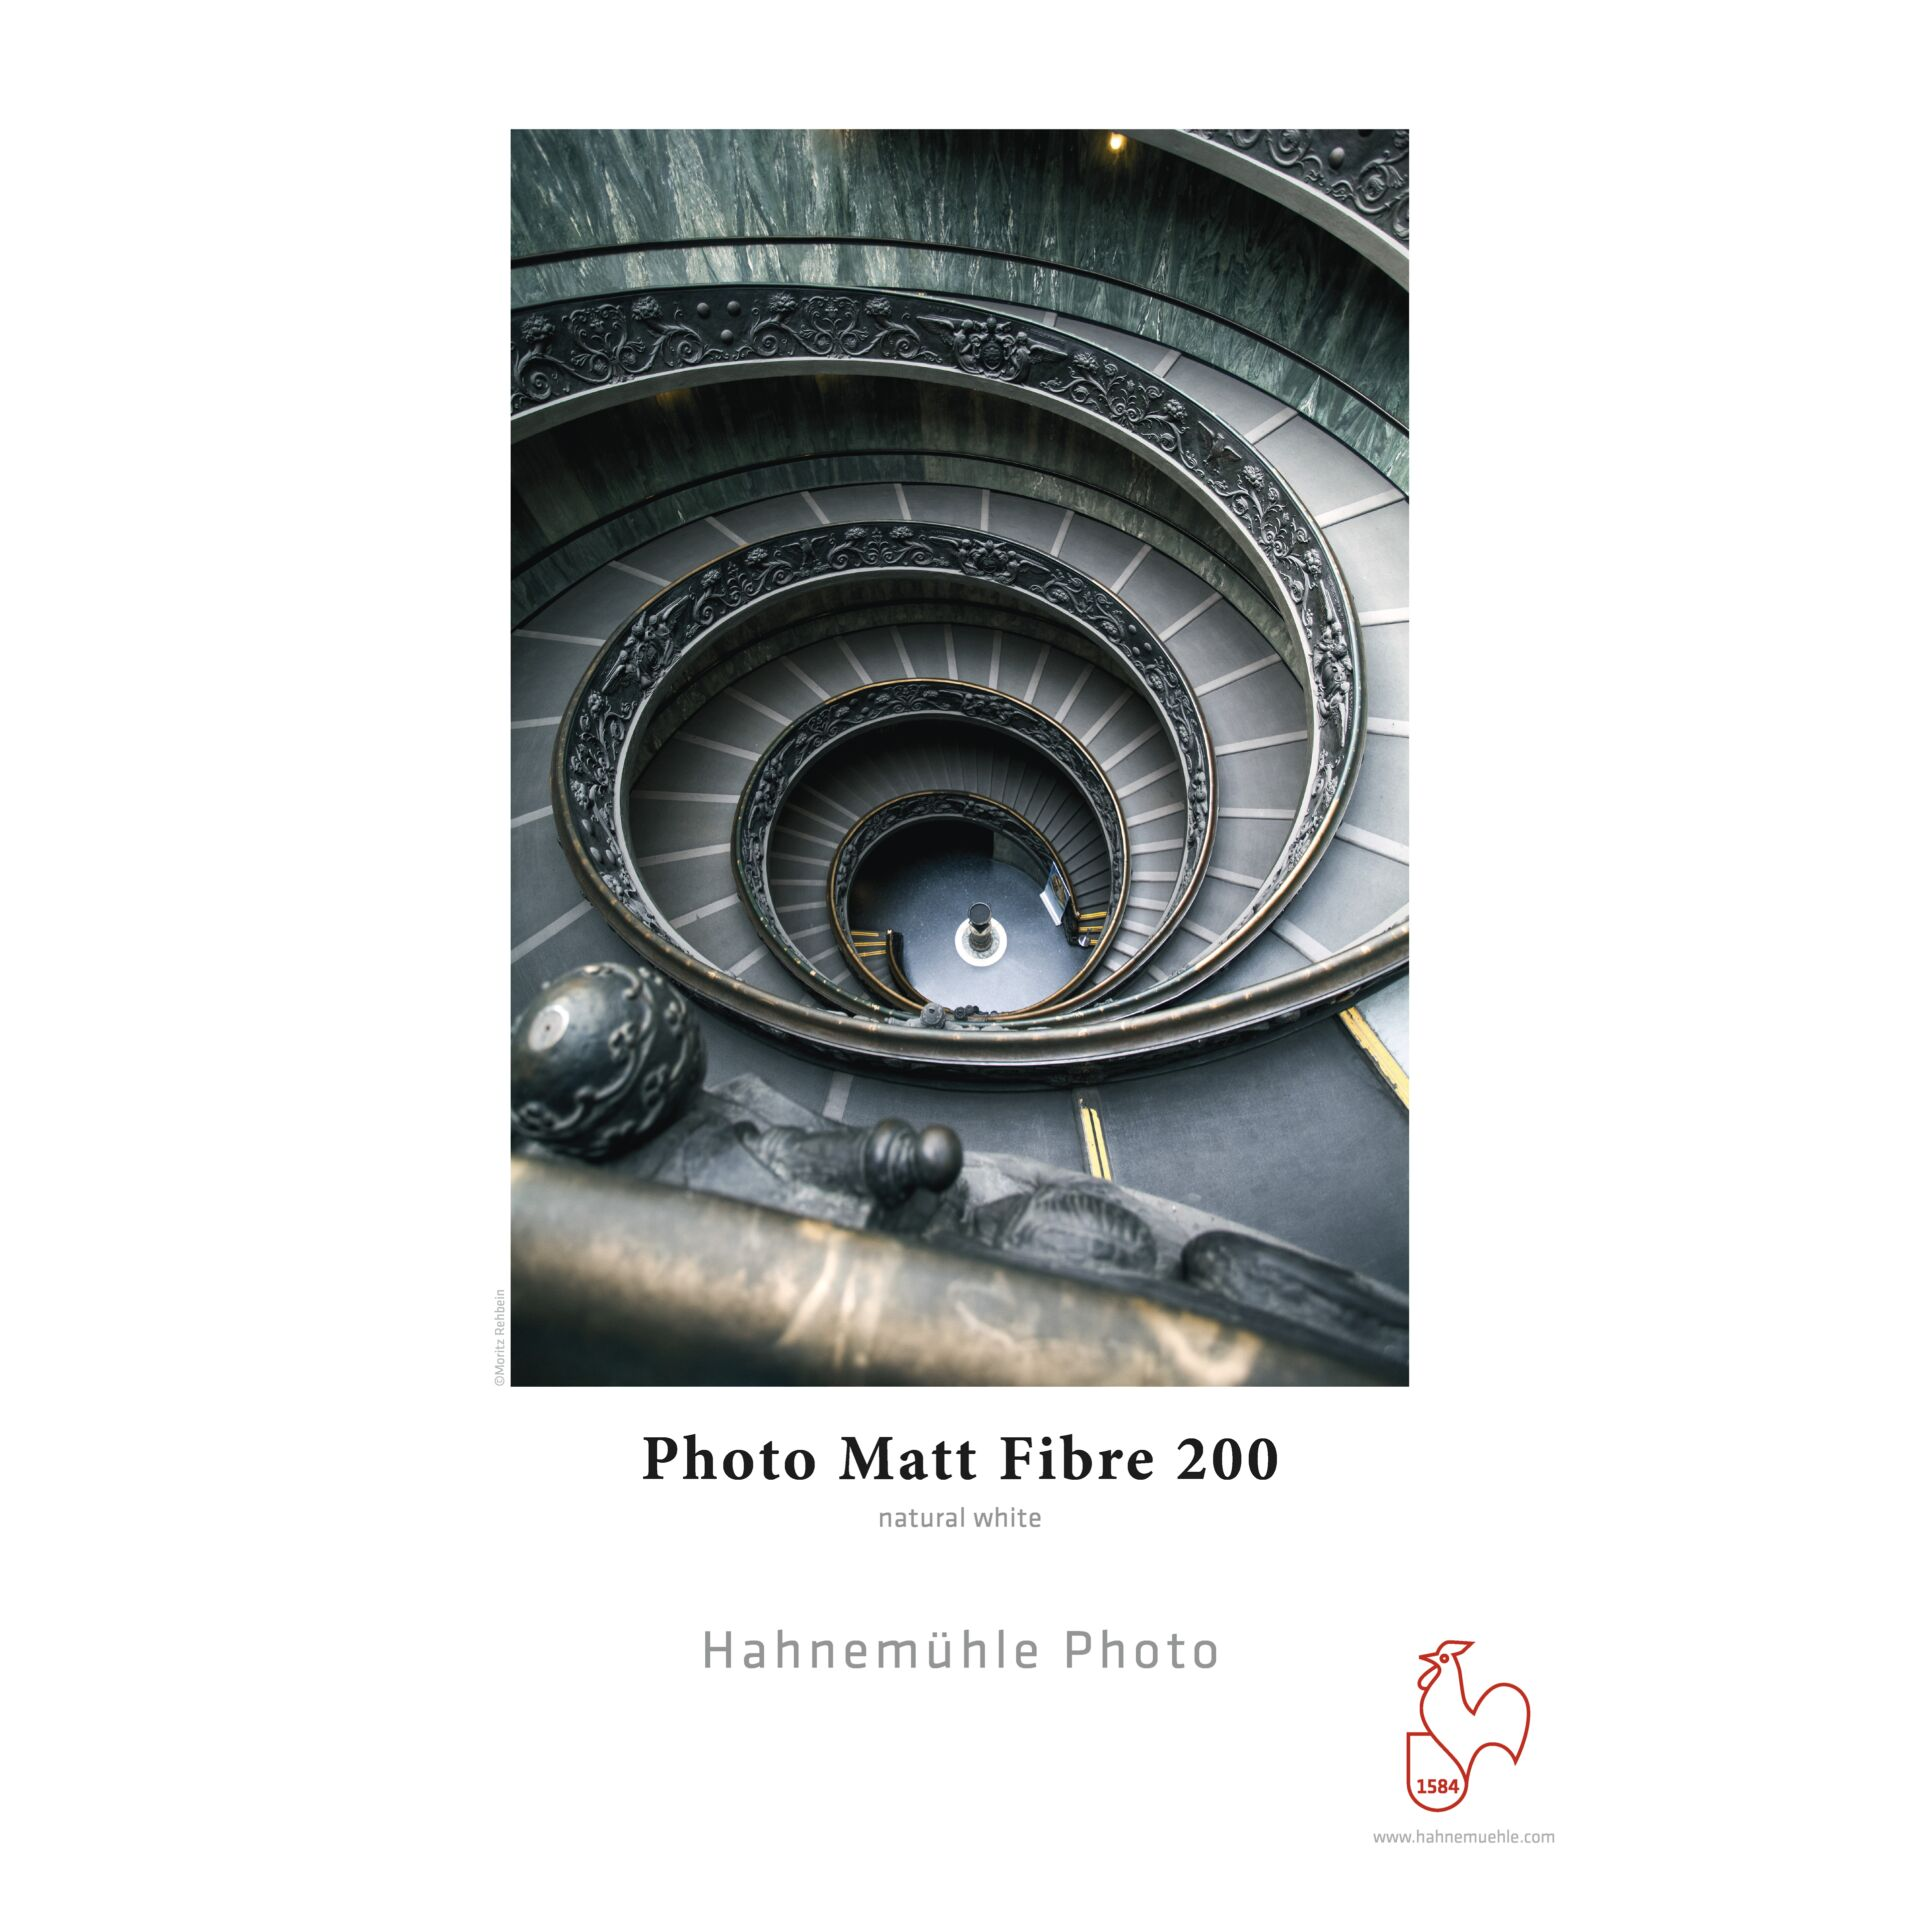 Hahnemuhle Photo Matt Fibre A2 200gr (25 sheets)